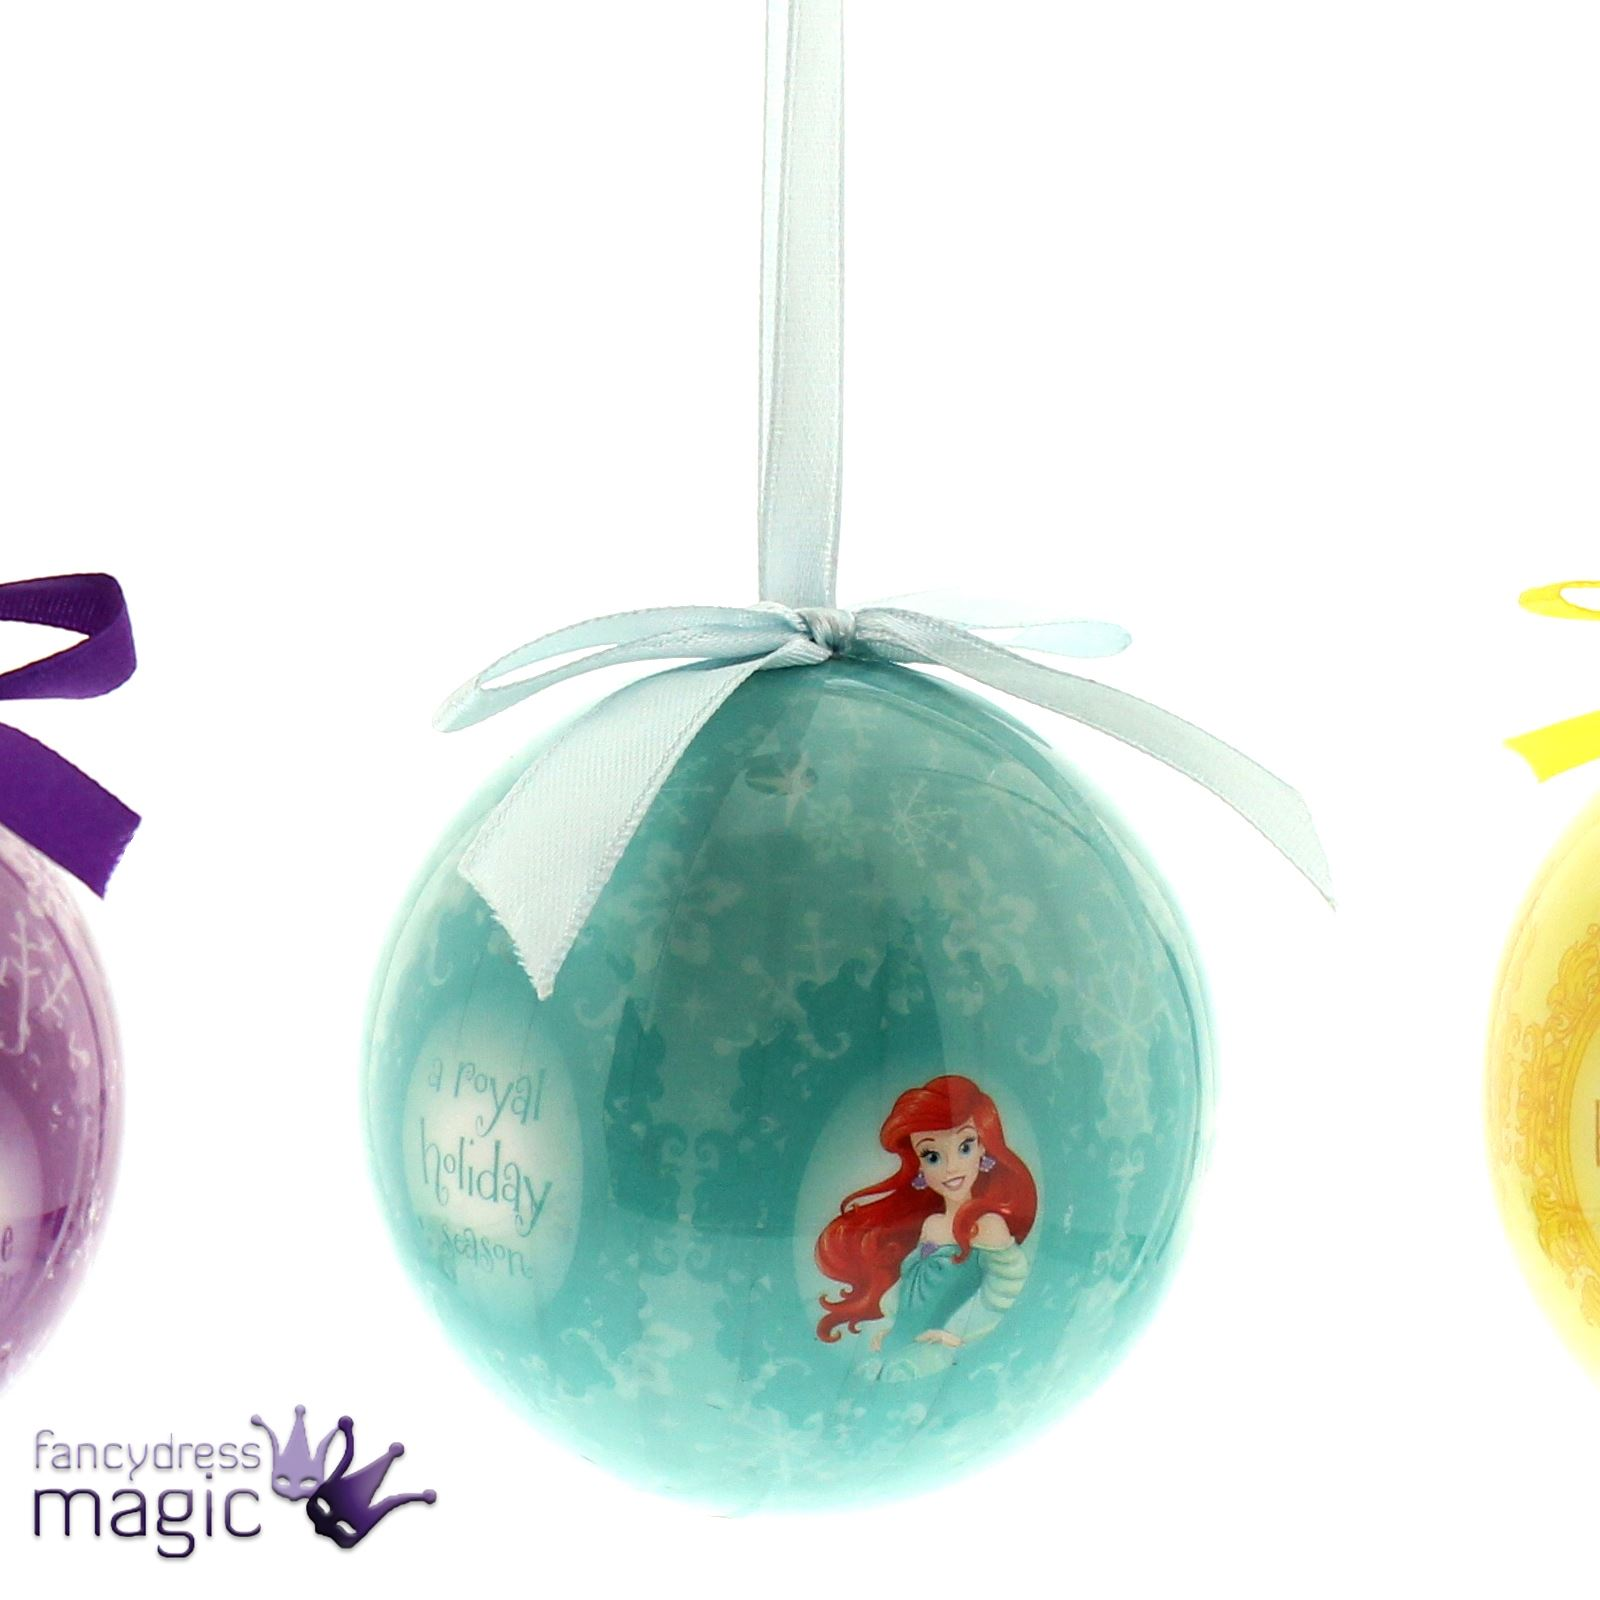 #BB9F10 Disney Princess Decoupage 7cm Christmas Xmas Tree Hanging  6365 décoration noel découpage 1600x1600 px @ aertt.com